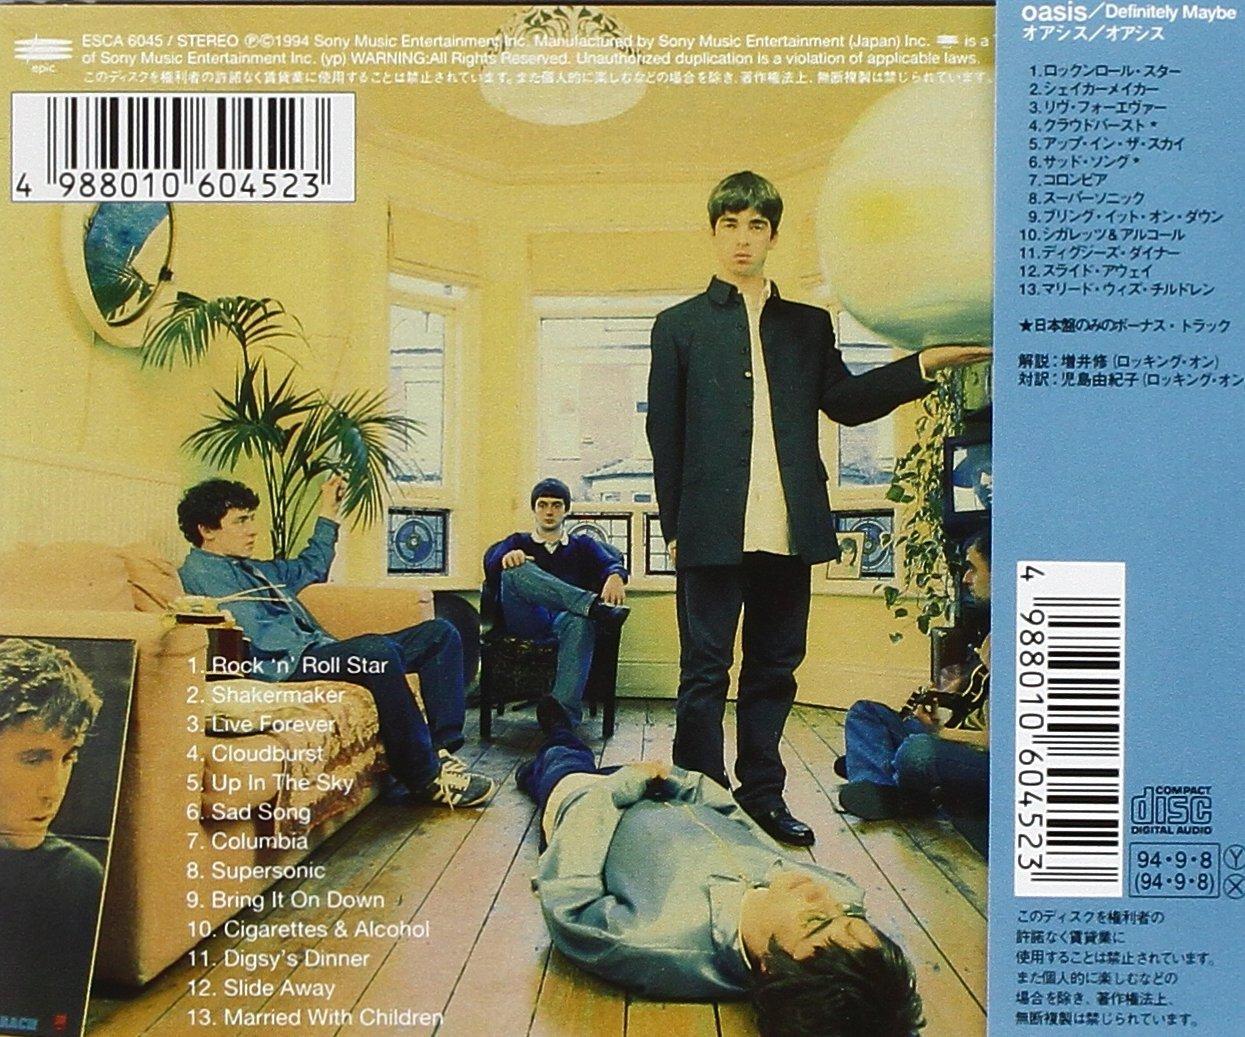 Amazon com Oasis Definitely  Oasis Definitely Maybe Deluxe